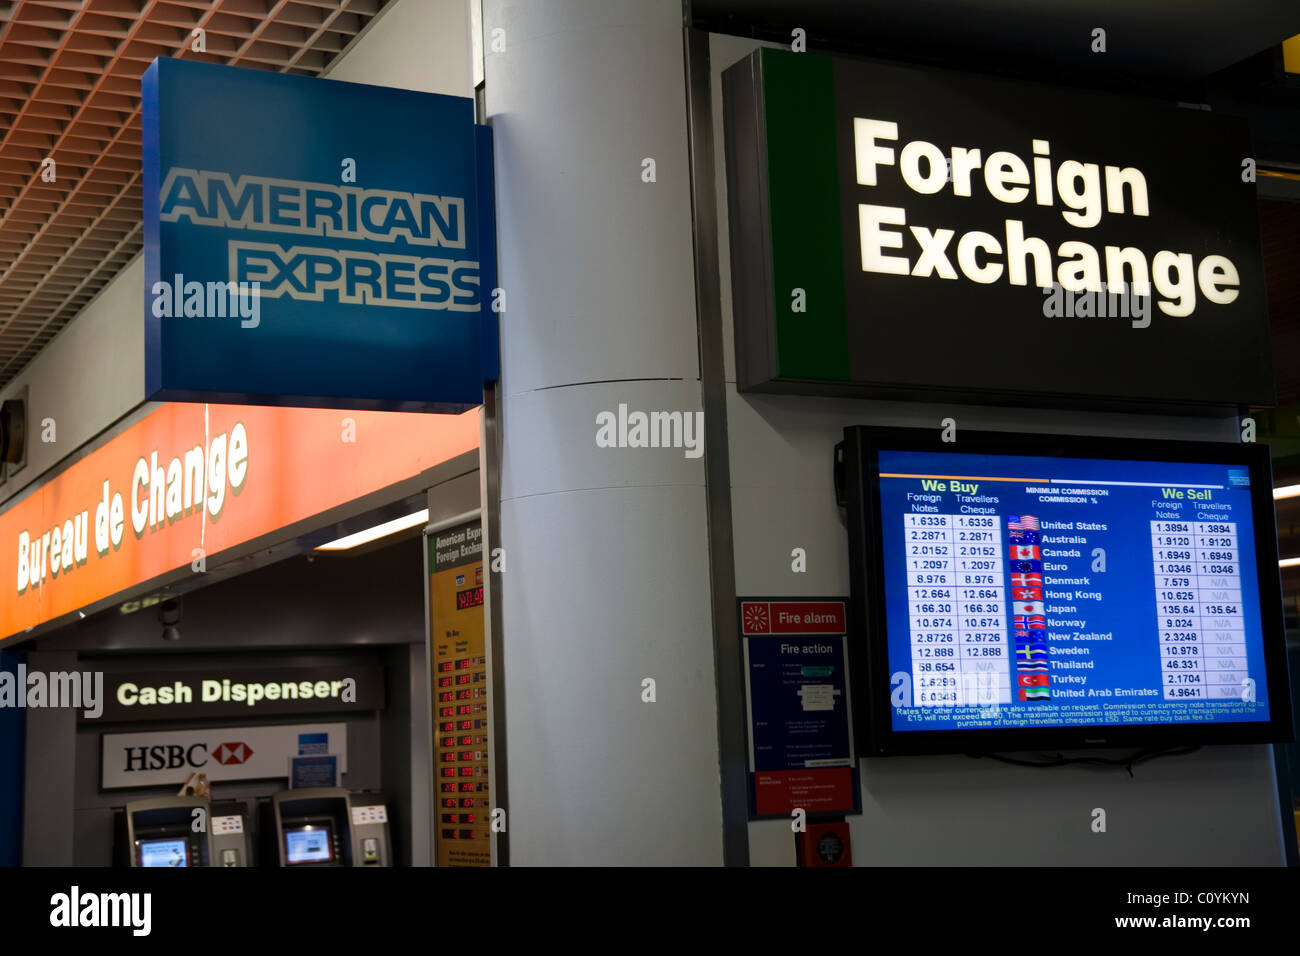 American express bureau de change office bildschirm anzeige der